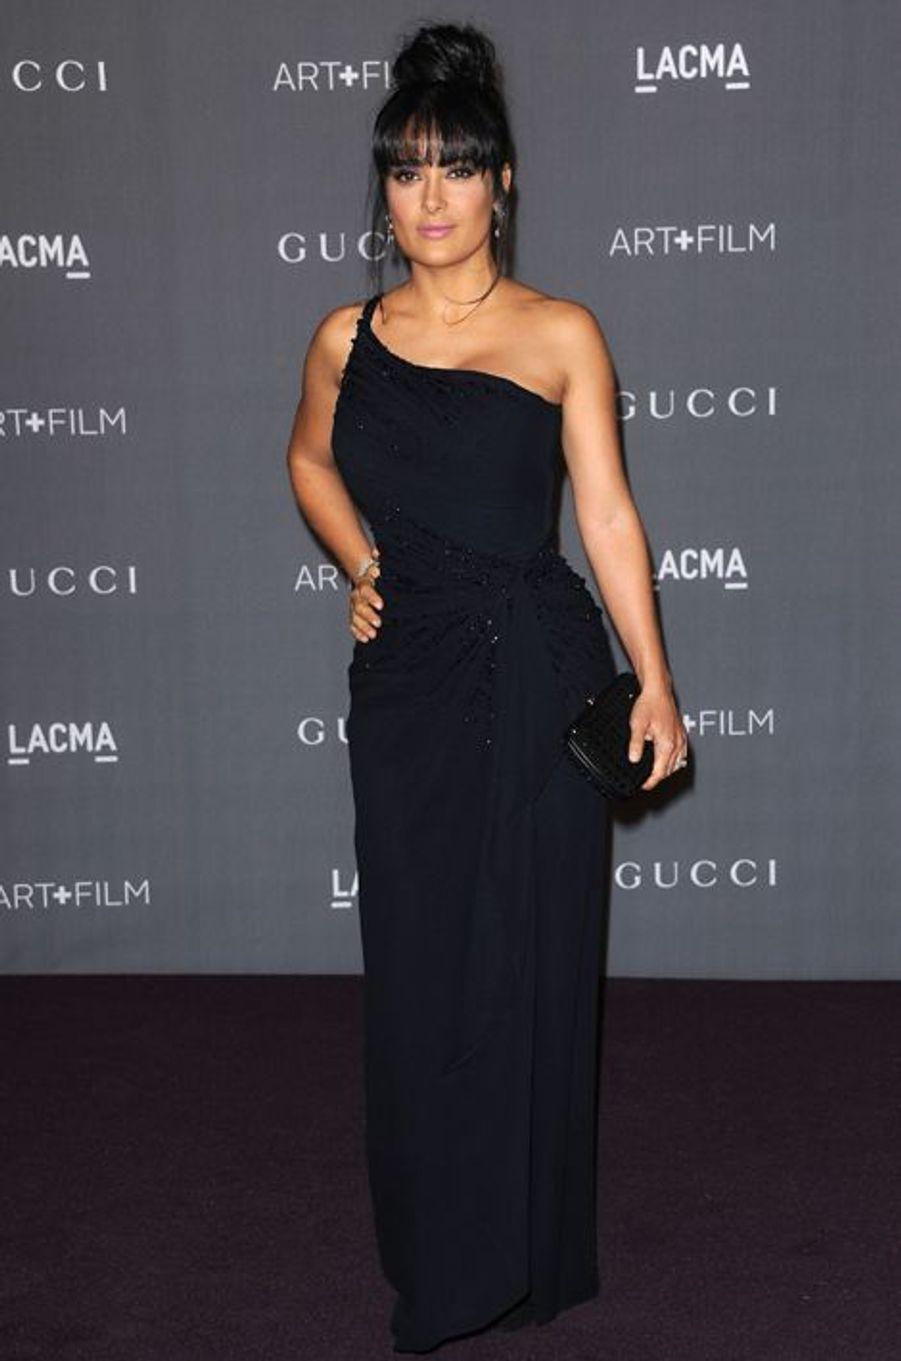 Salma Hayek en Gucci au LACMA Art + Film Gala en octobre 2012